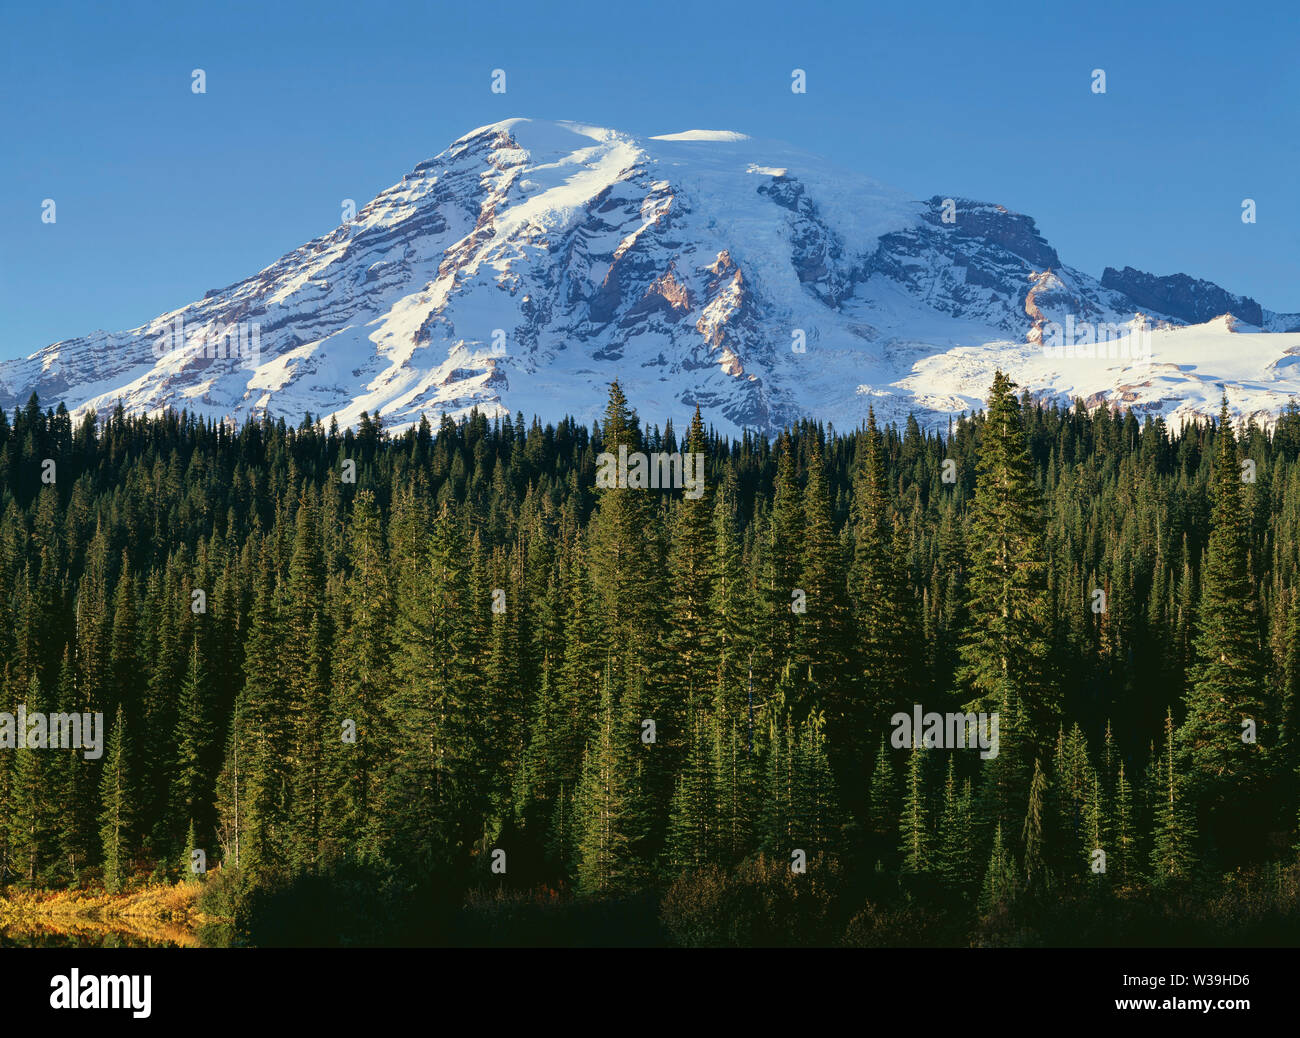 USA, Washington, Mt. Rainier National Park, Mt. Rainier with fresh autumn snow rises above evergreen forest at Reflection Lake. - Stock Image